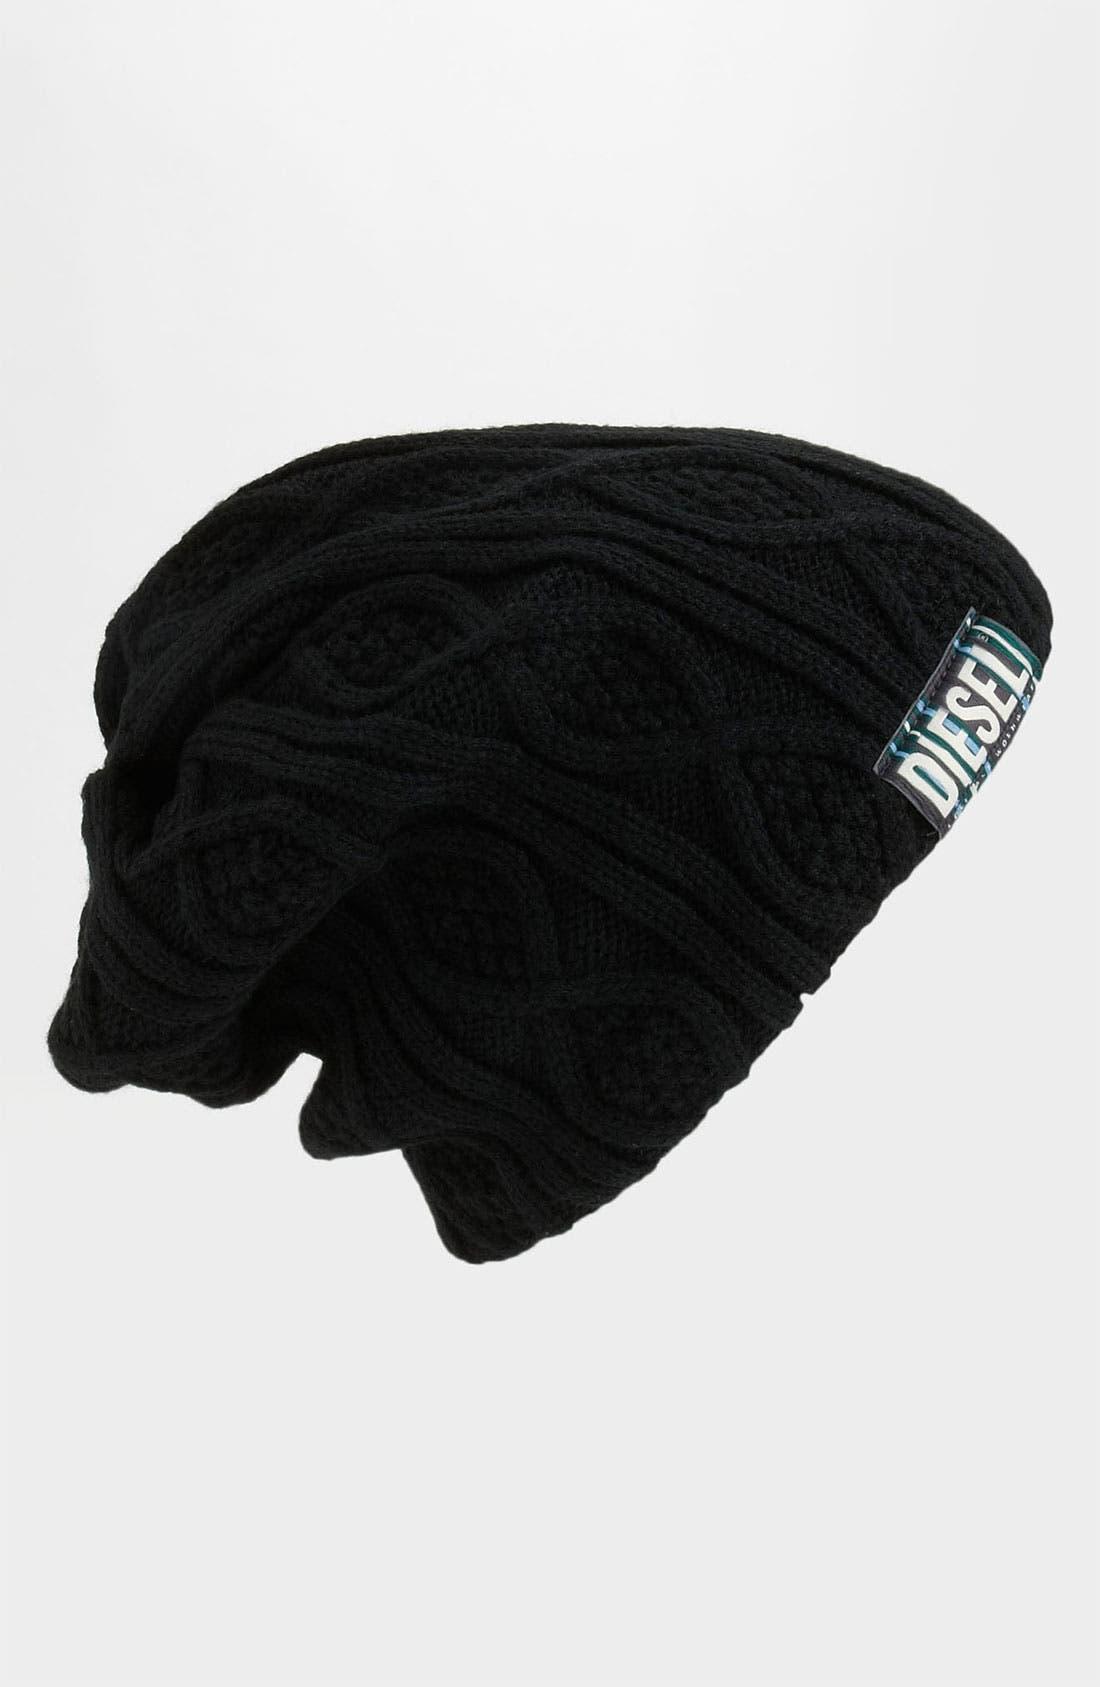 Alternate Image 1 Selected - DIESEL® 'Krissyet' Cable Knit Cap